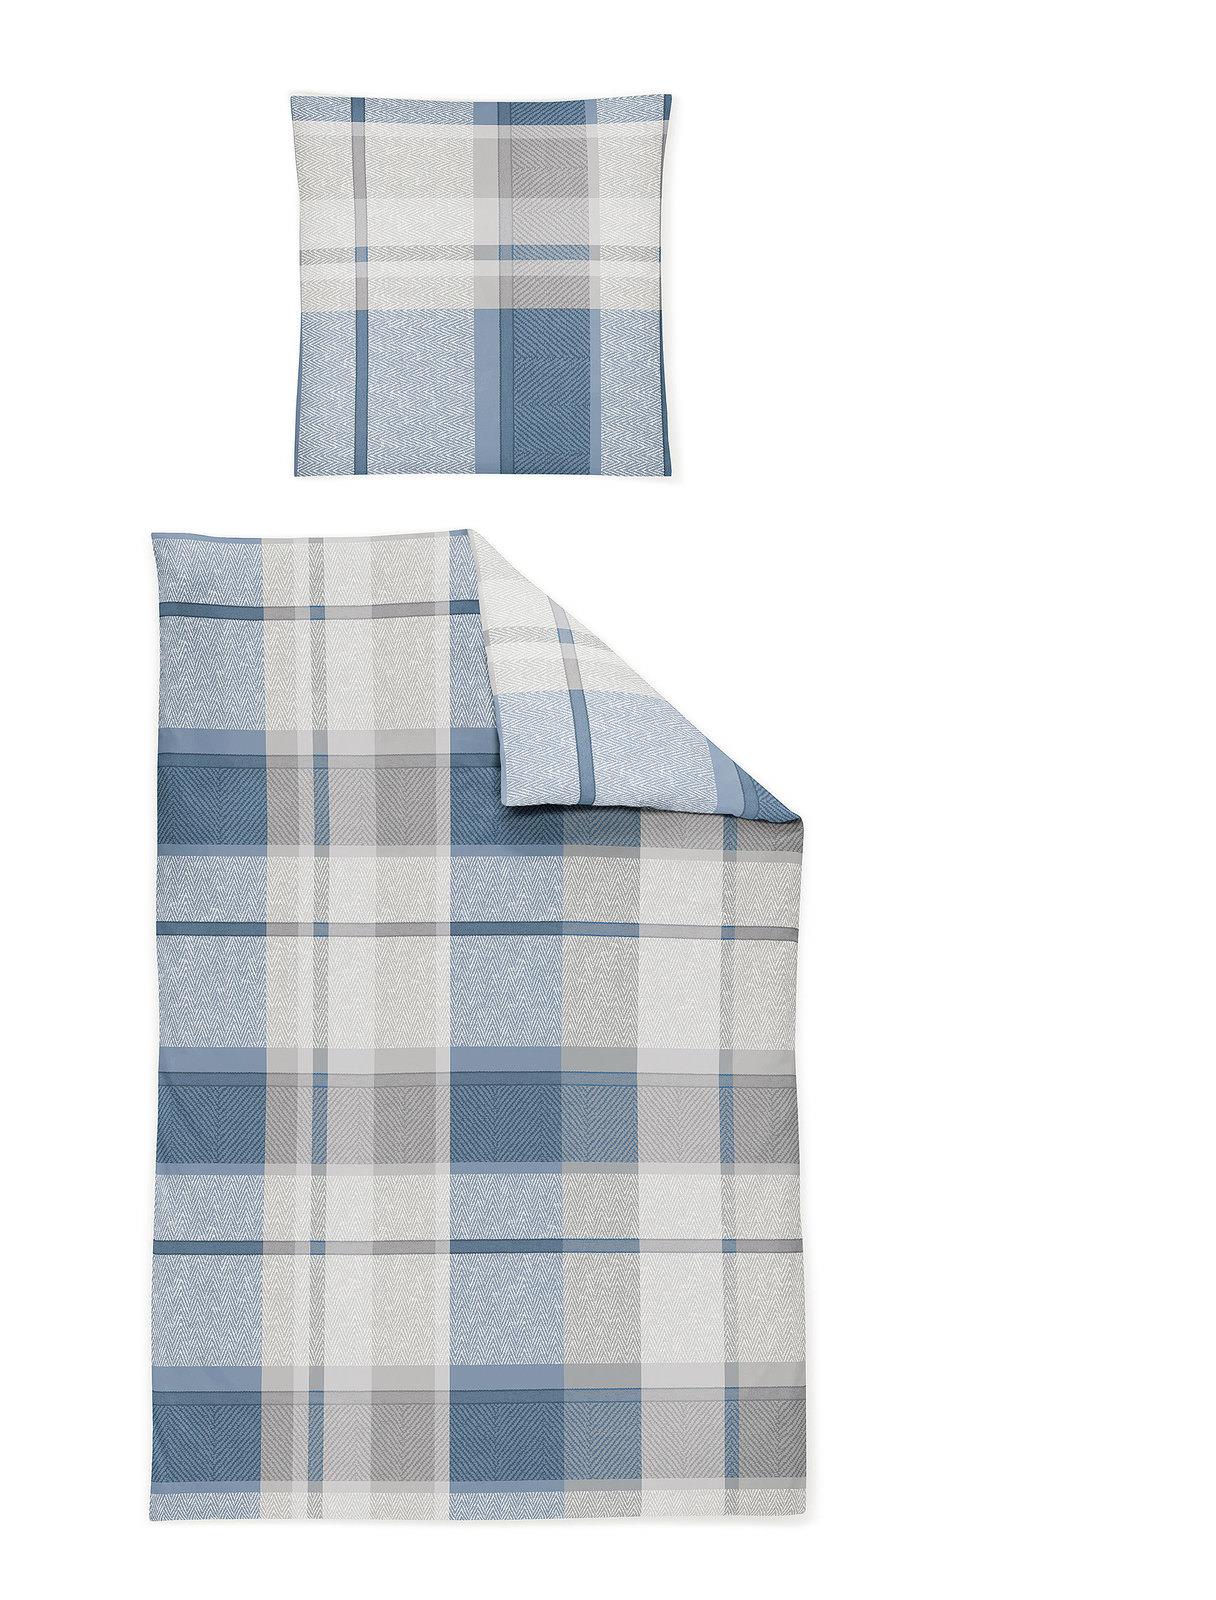 Irisette Soft Jersey Bettwäsche Blau Online Entdecken Knuffmann